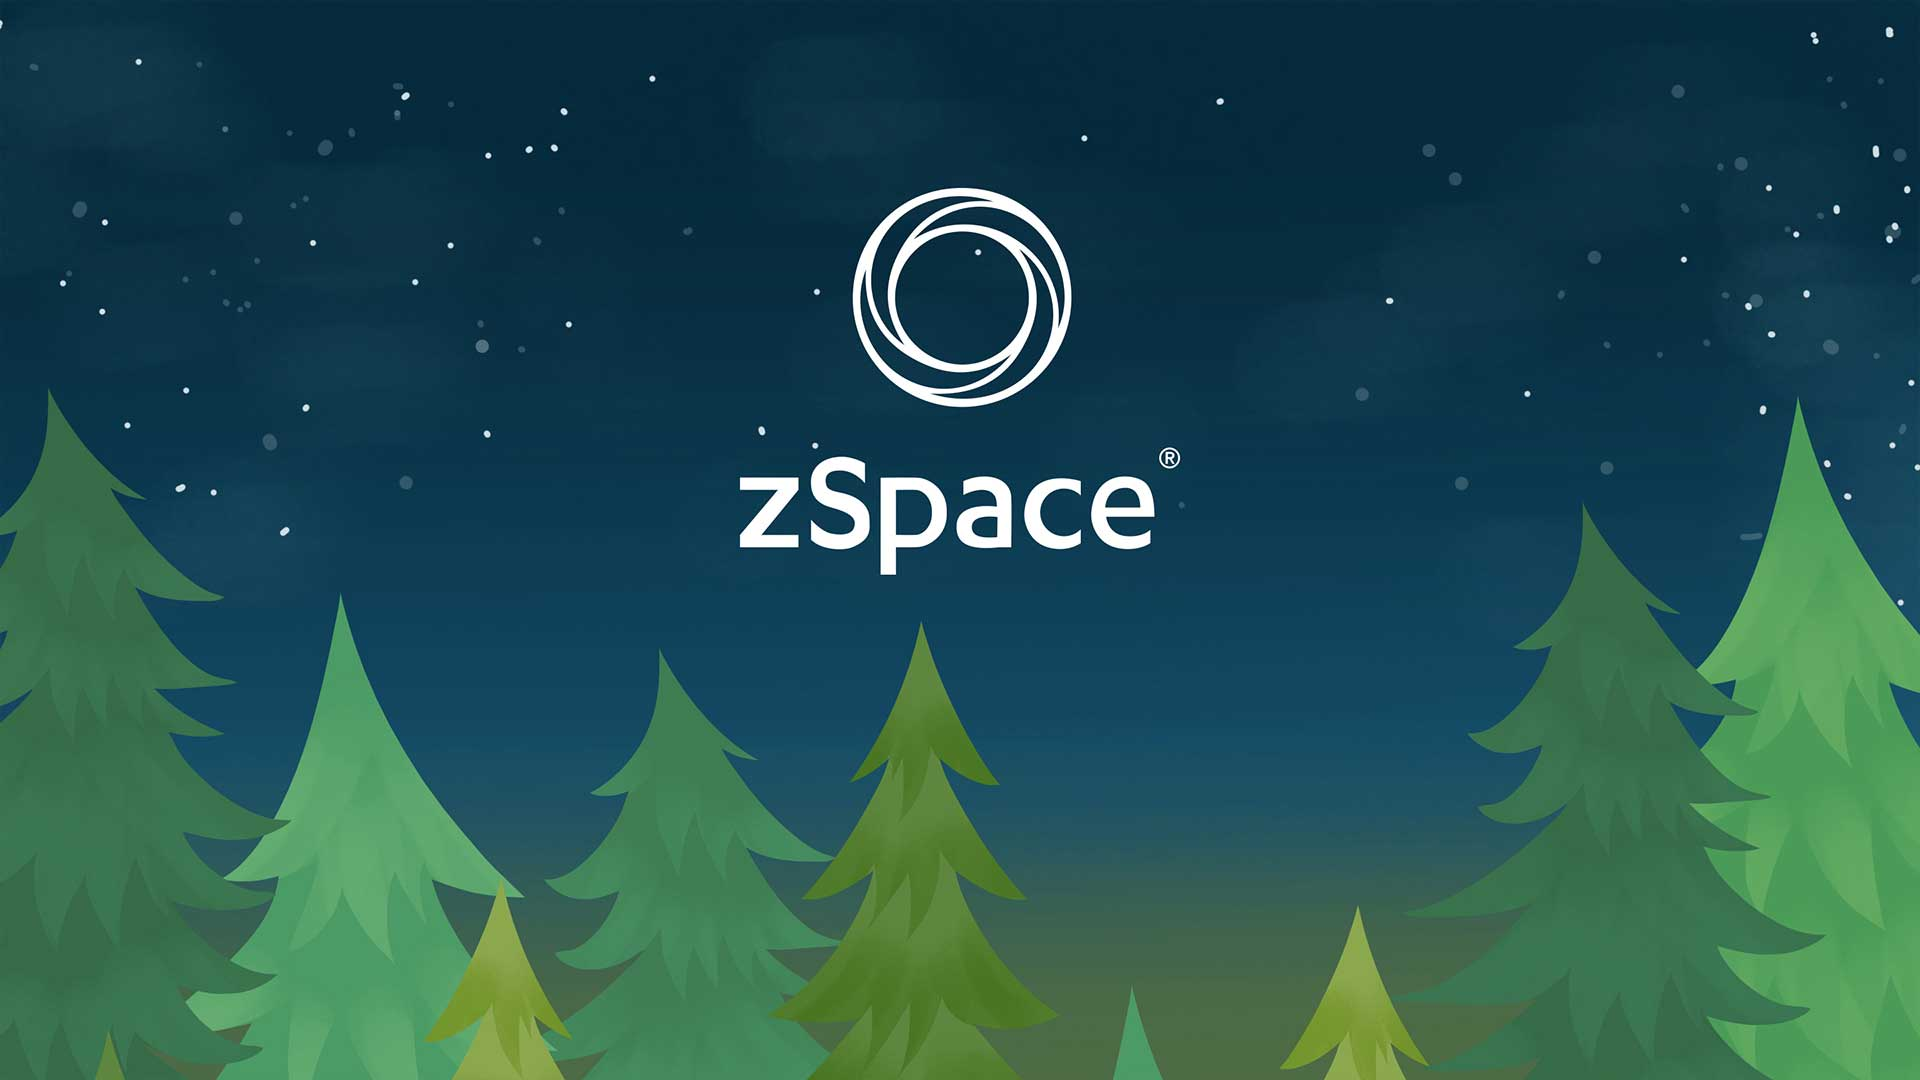 zSpace_09.jpg